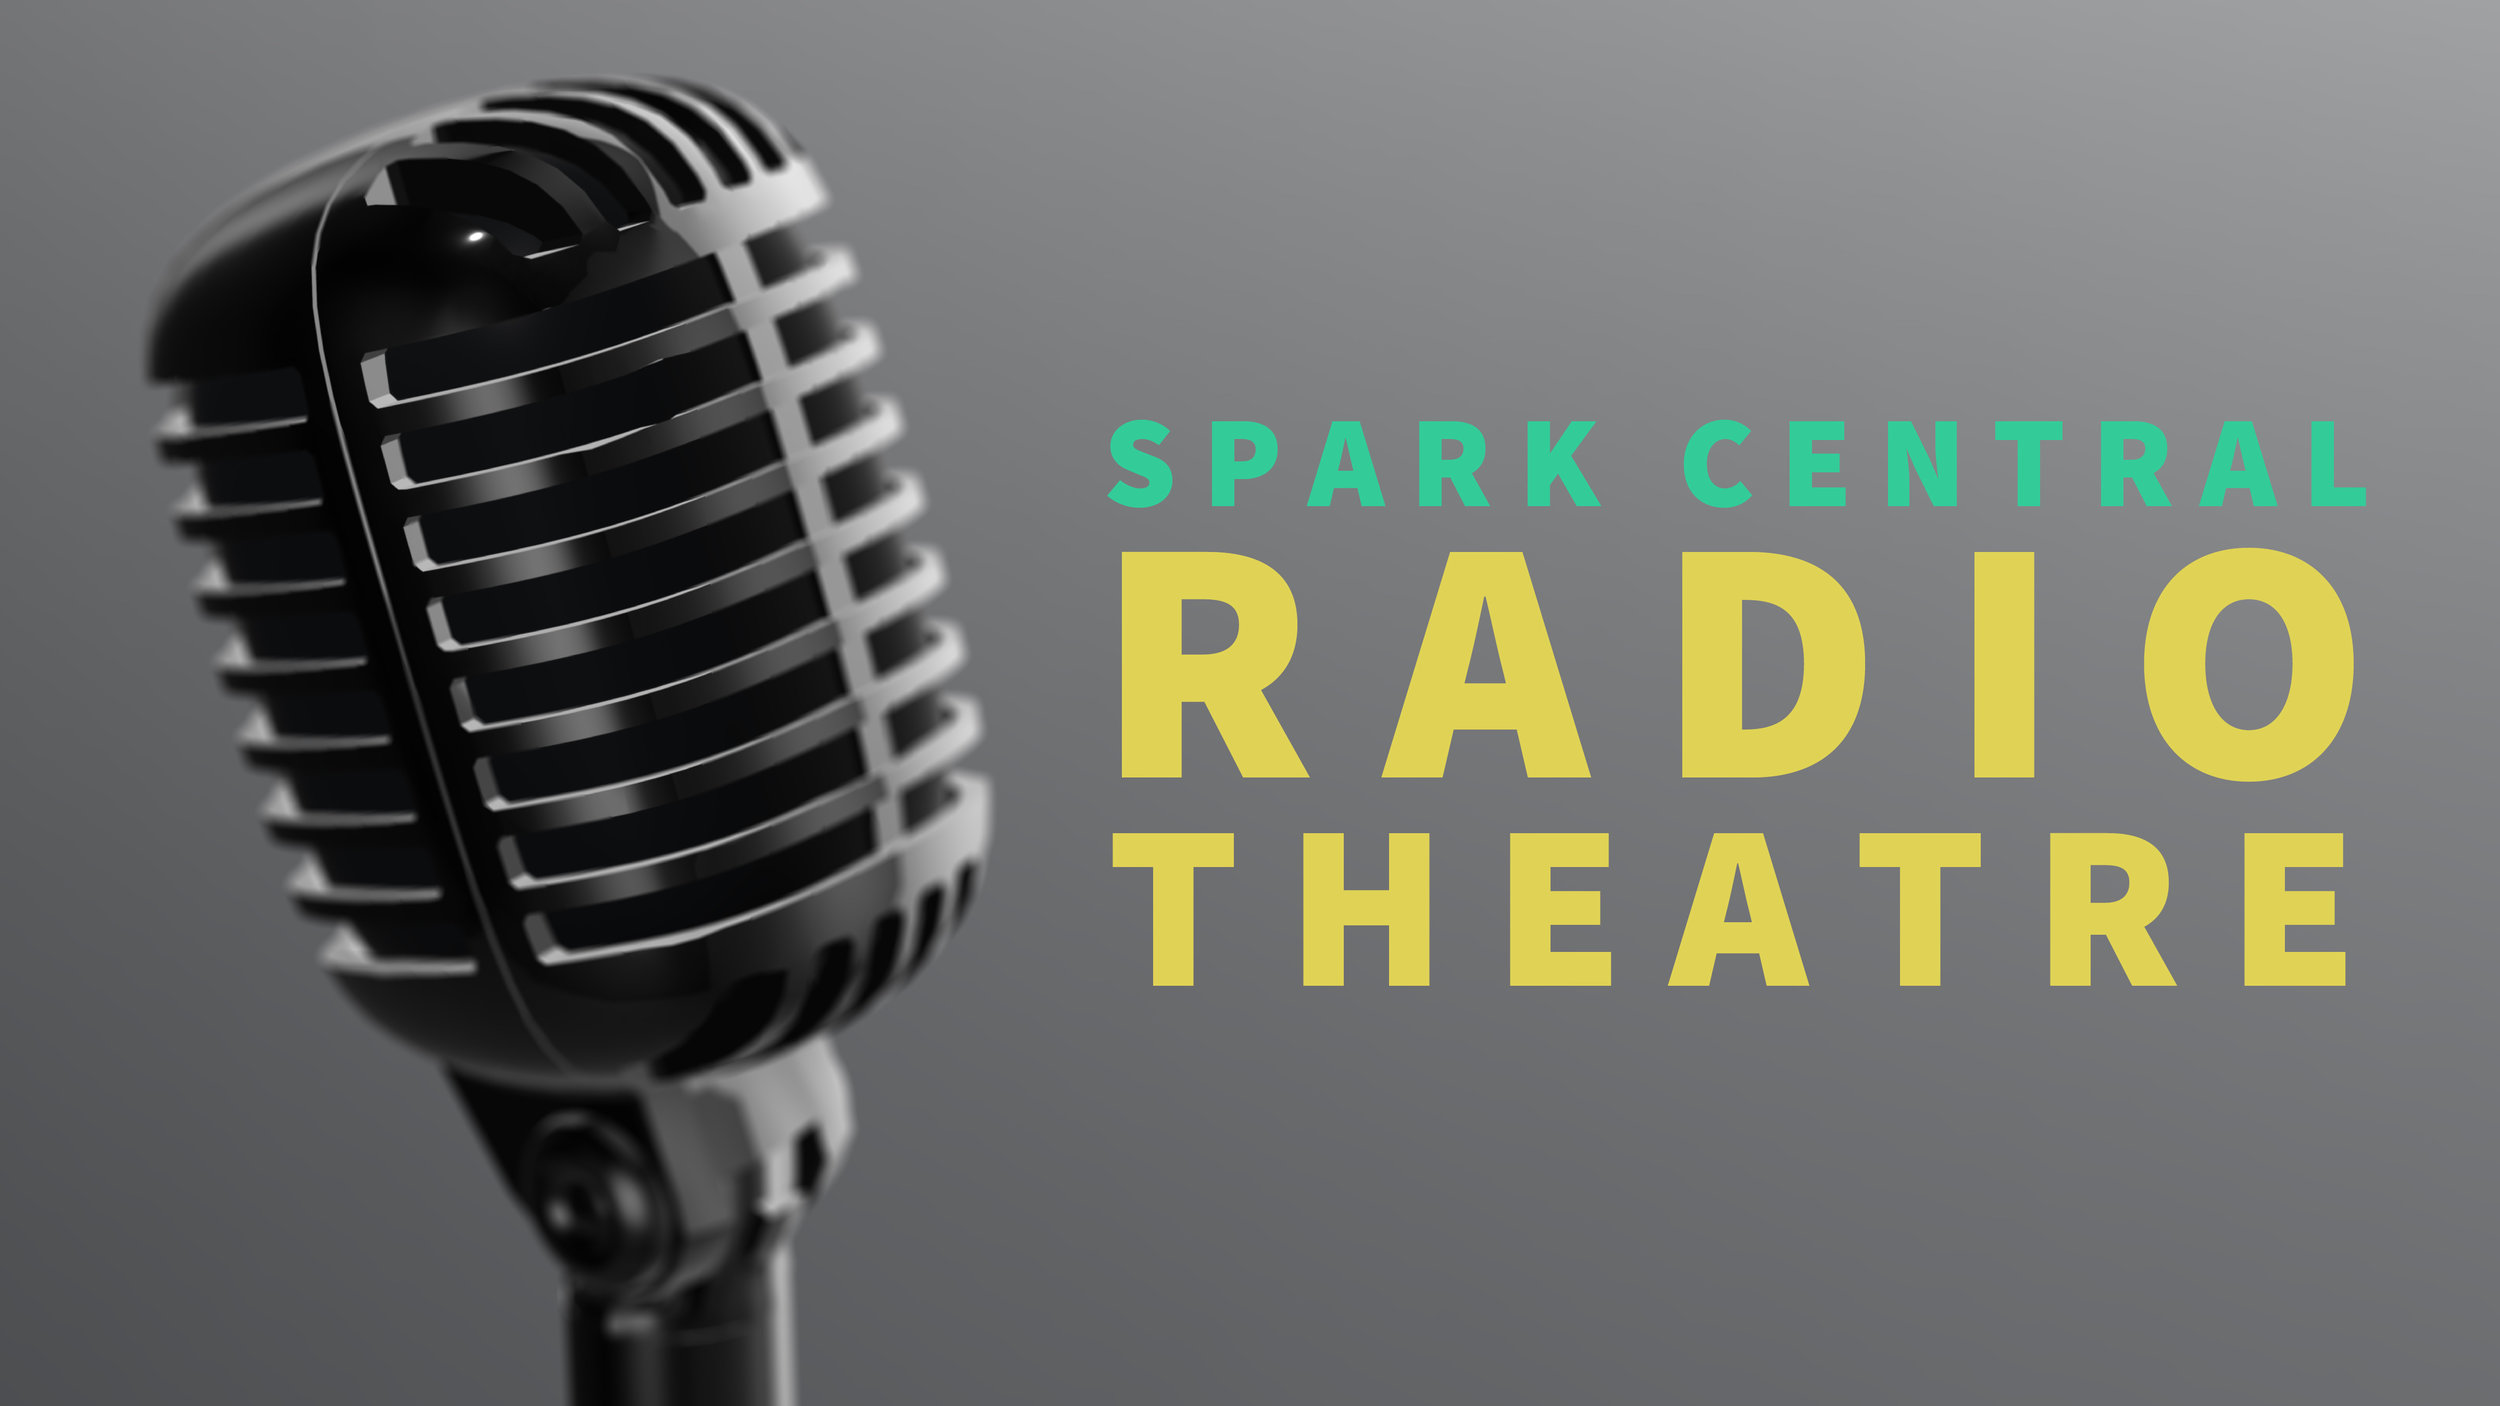 Radio Theatre-2-22.jpg